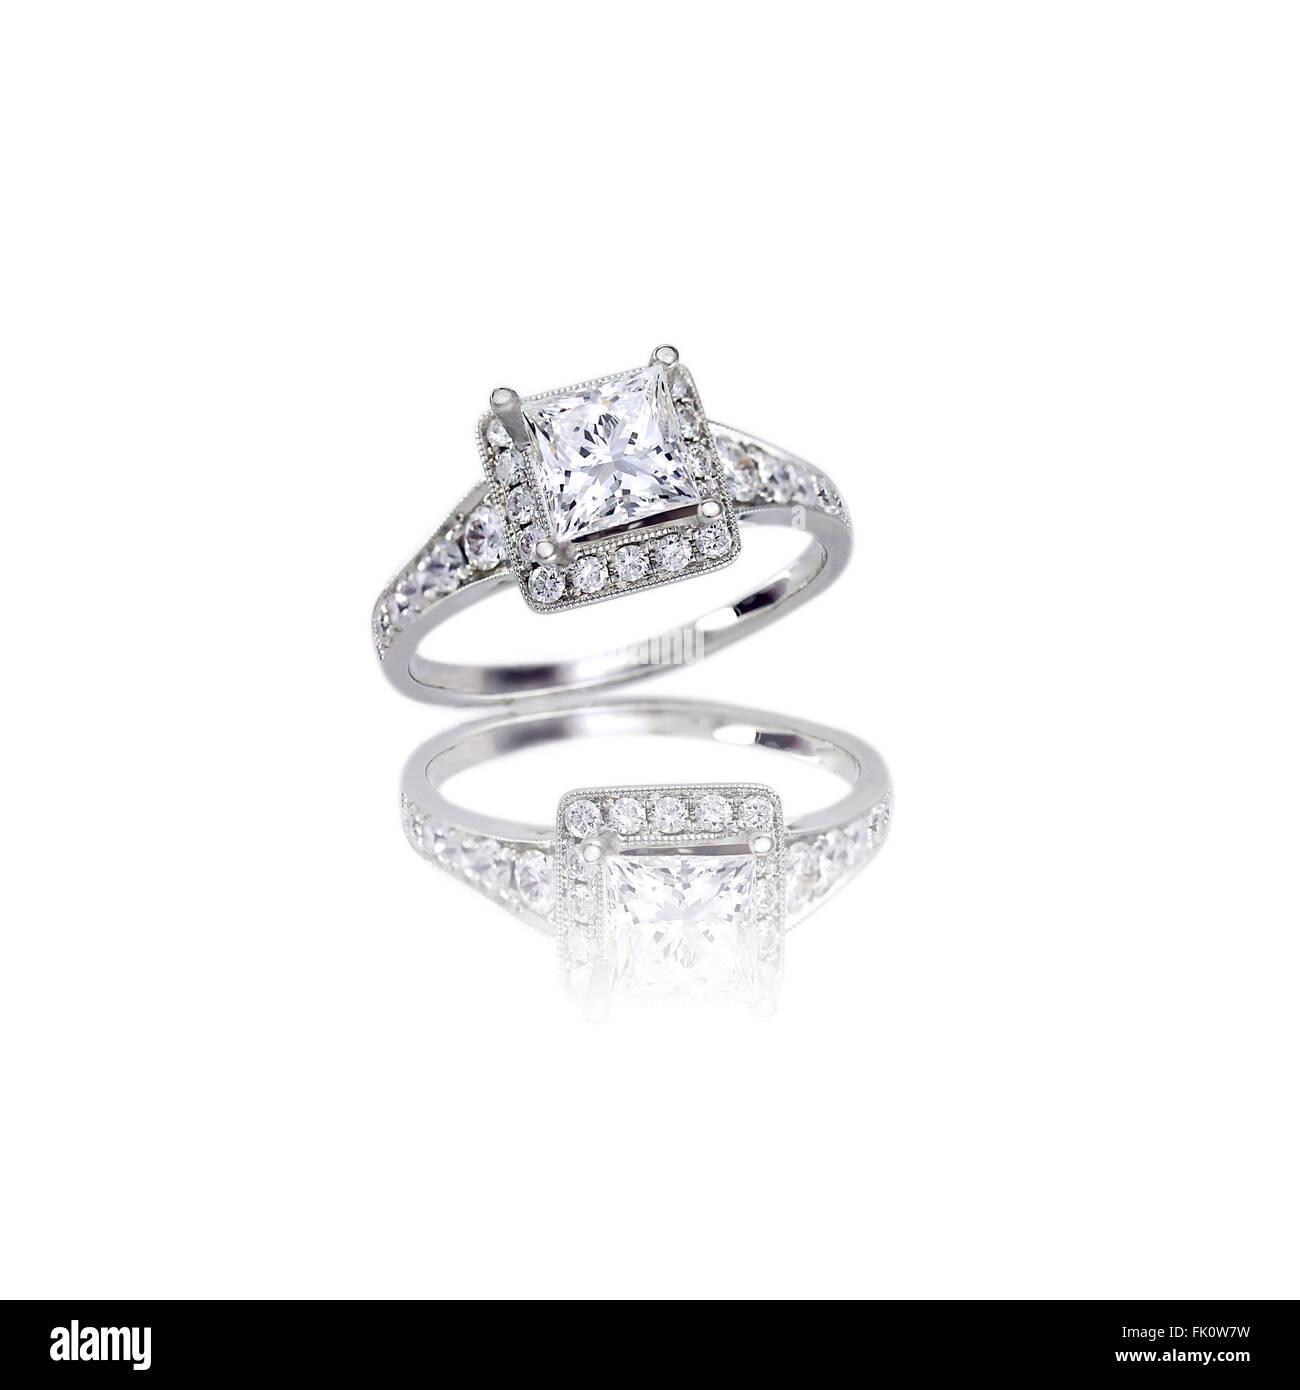 Beautiful Diamond Wedding Band Princess Cut Halo Setting Engagement Ring Isolated On White With A Reflection